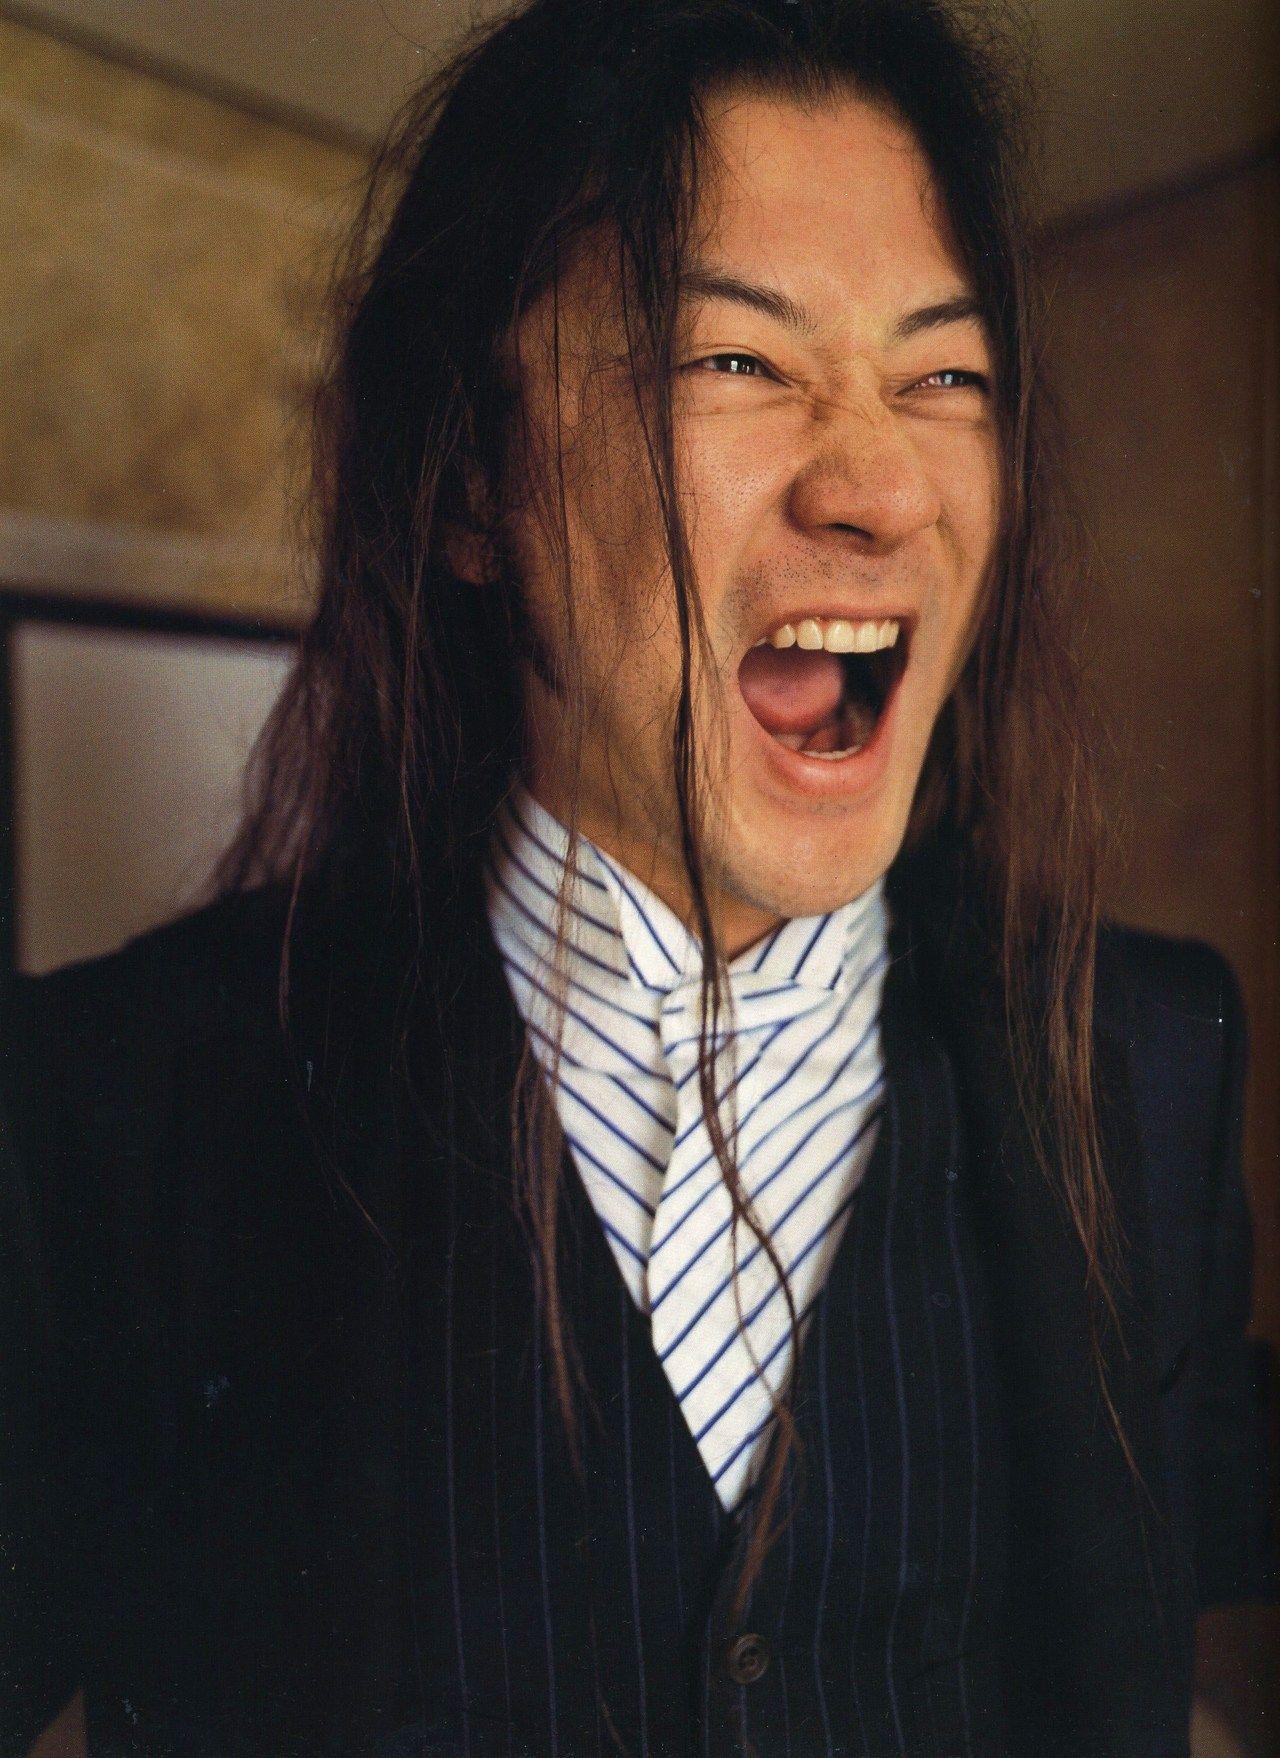 Tadanobu asano is a japanese actor and musician who was born on november 27, 1973, in yokohama, japan. Tadanobu Asano (With images) | Heavy people, Marvel comic ...